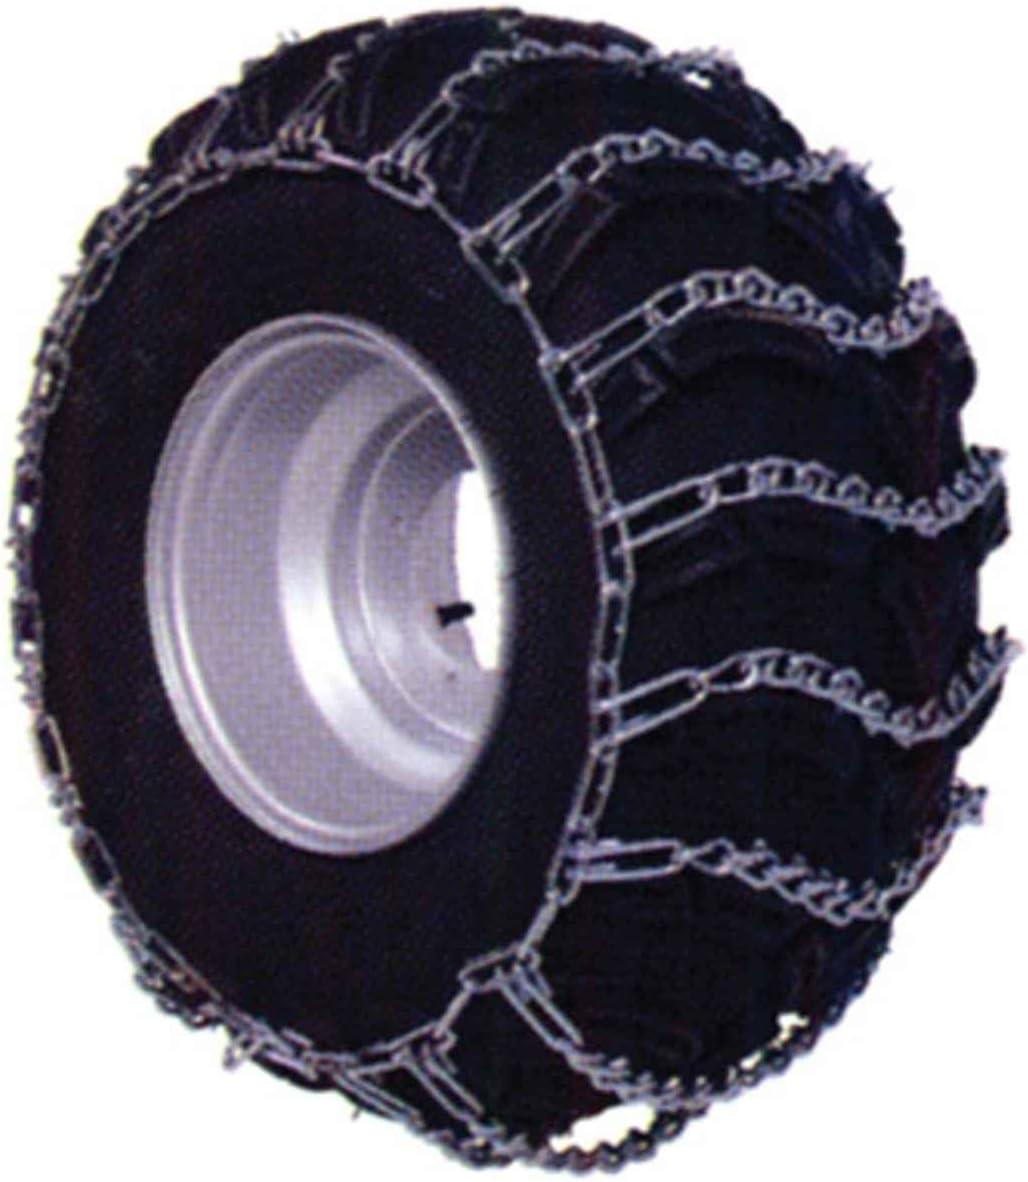 WALLINGFORD V-BAR Chains 51X14 2 Space